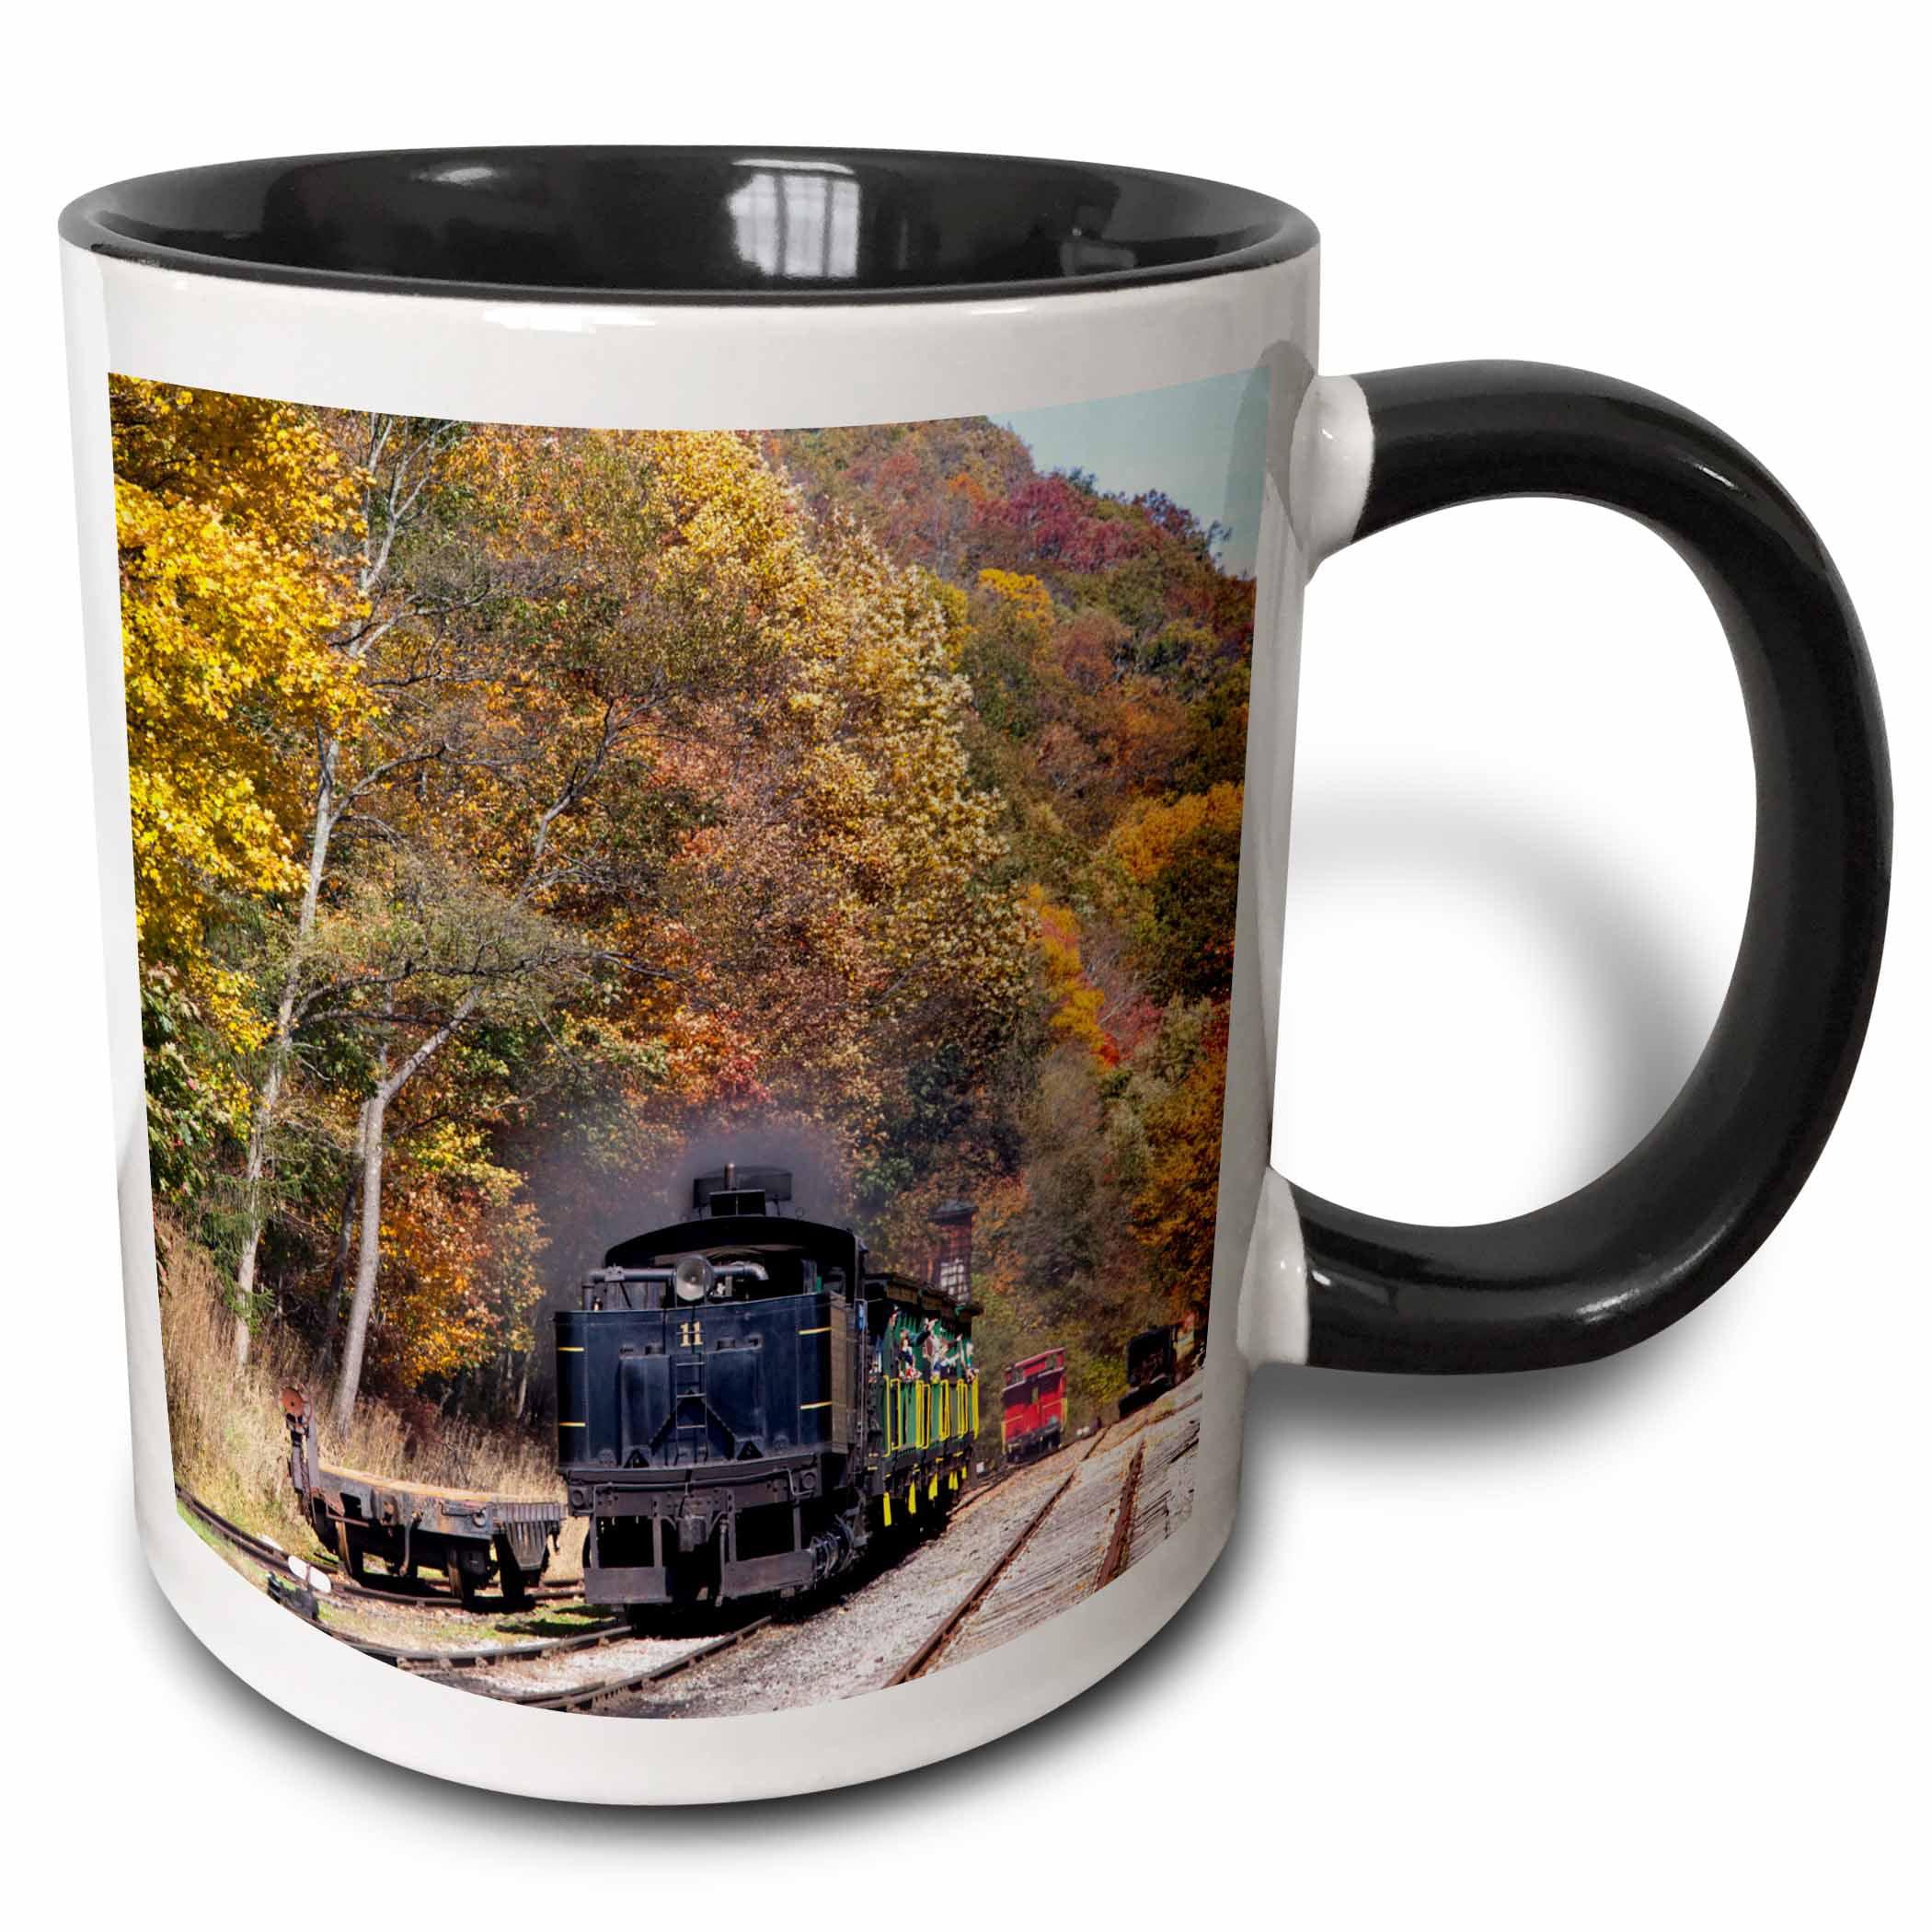 3dRose West Virginia, Cass Scenic Railroad, Steam train - US49 WBI0030 - Walter Bibikow, Two Tone Black Mug, 11oz